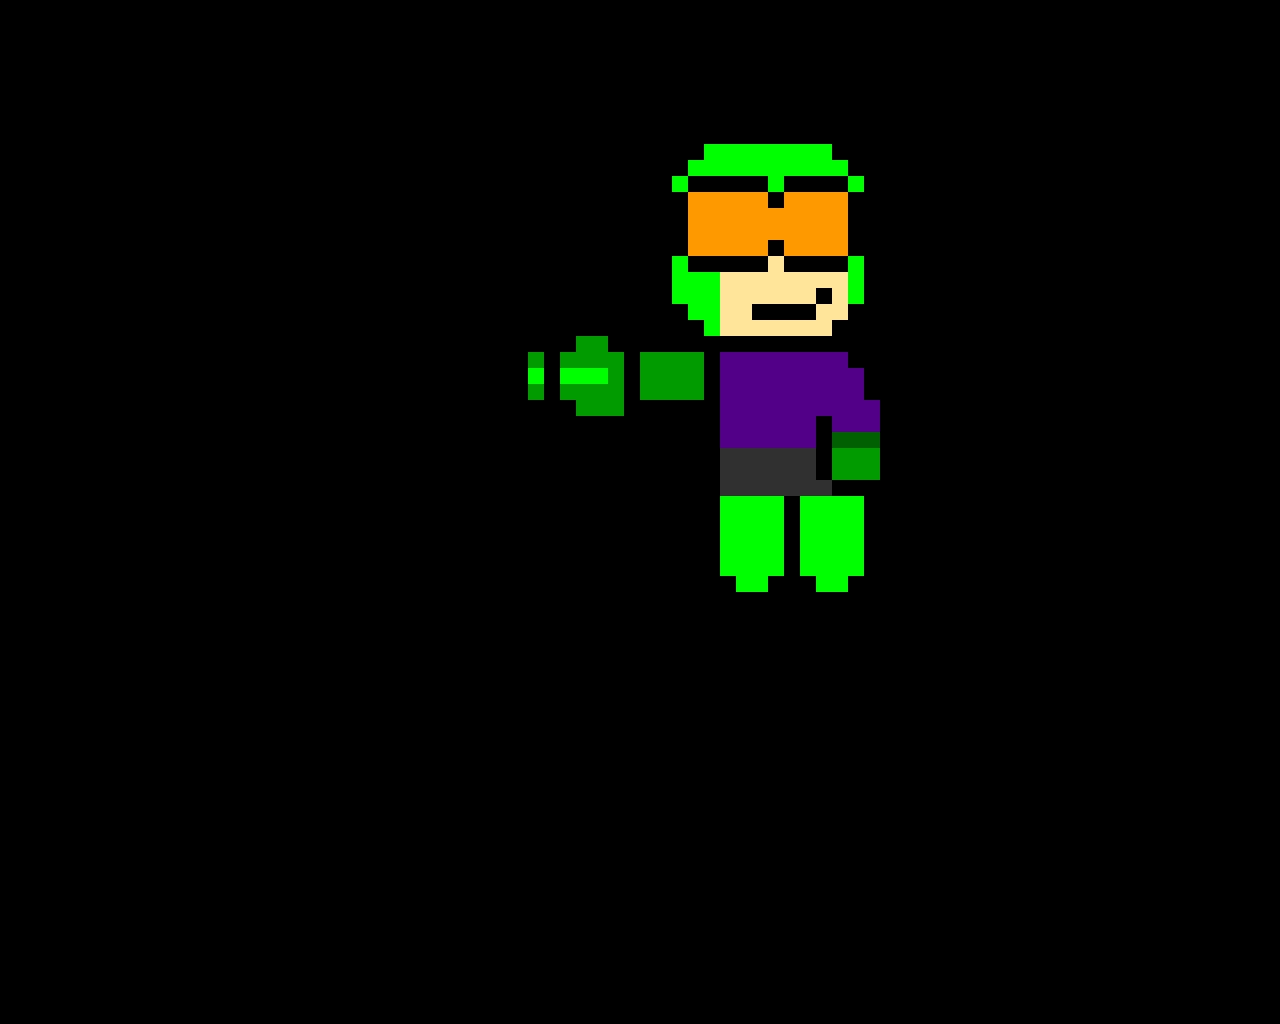 I made @corruption999 in a Mega Man style...